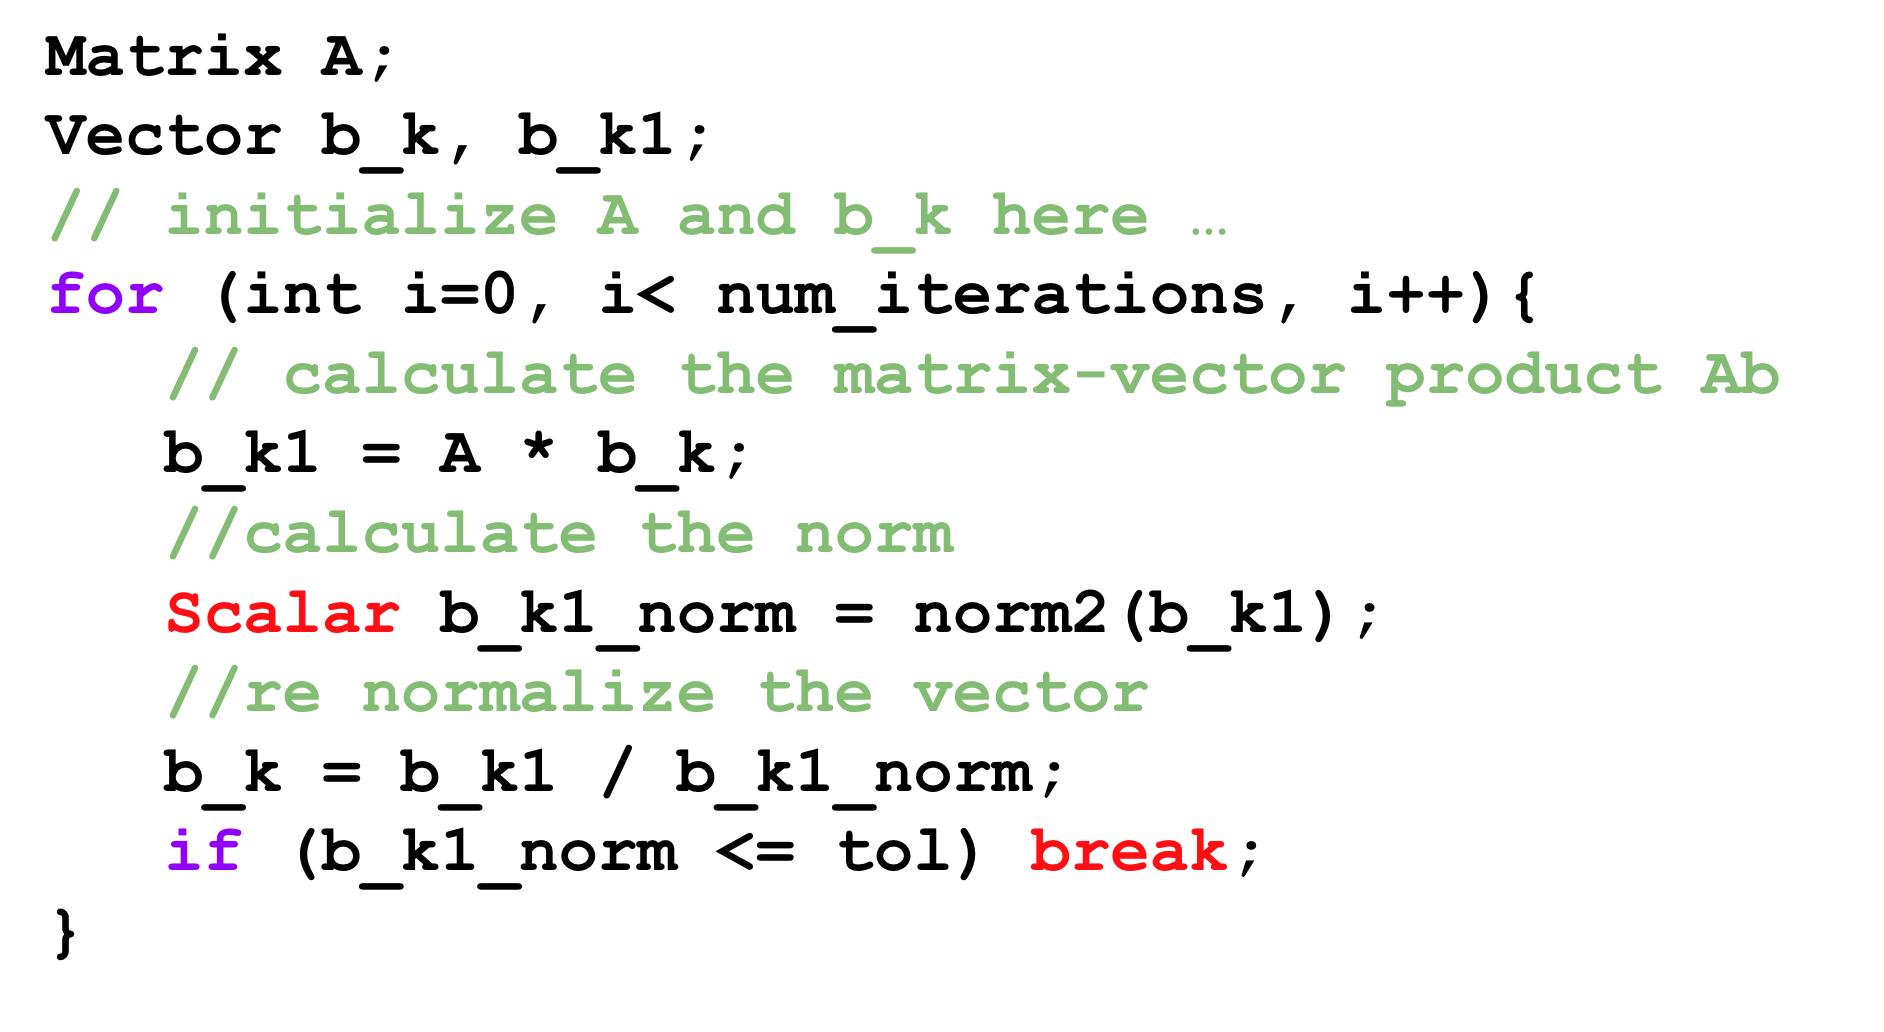 Utopia - a performance-portable C++ library for non-linear algebra